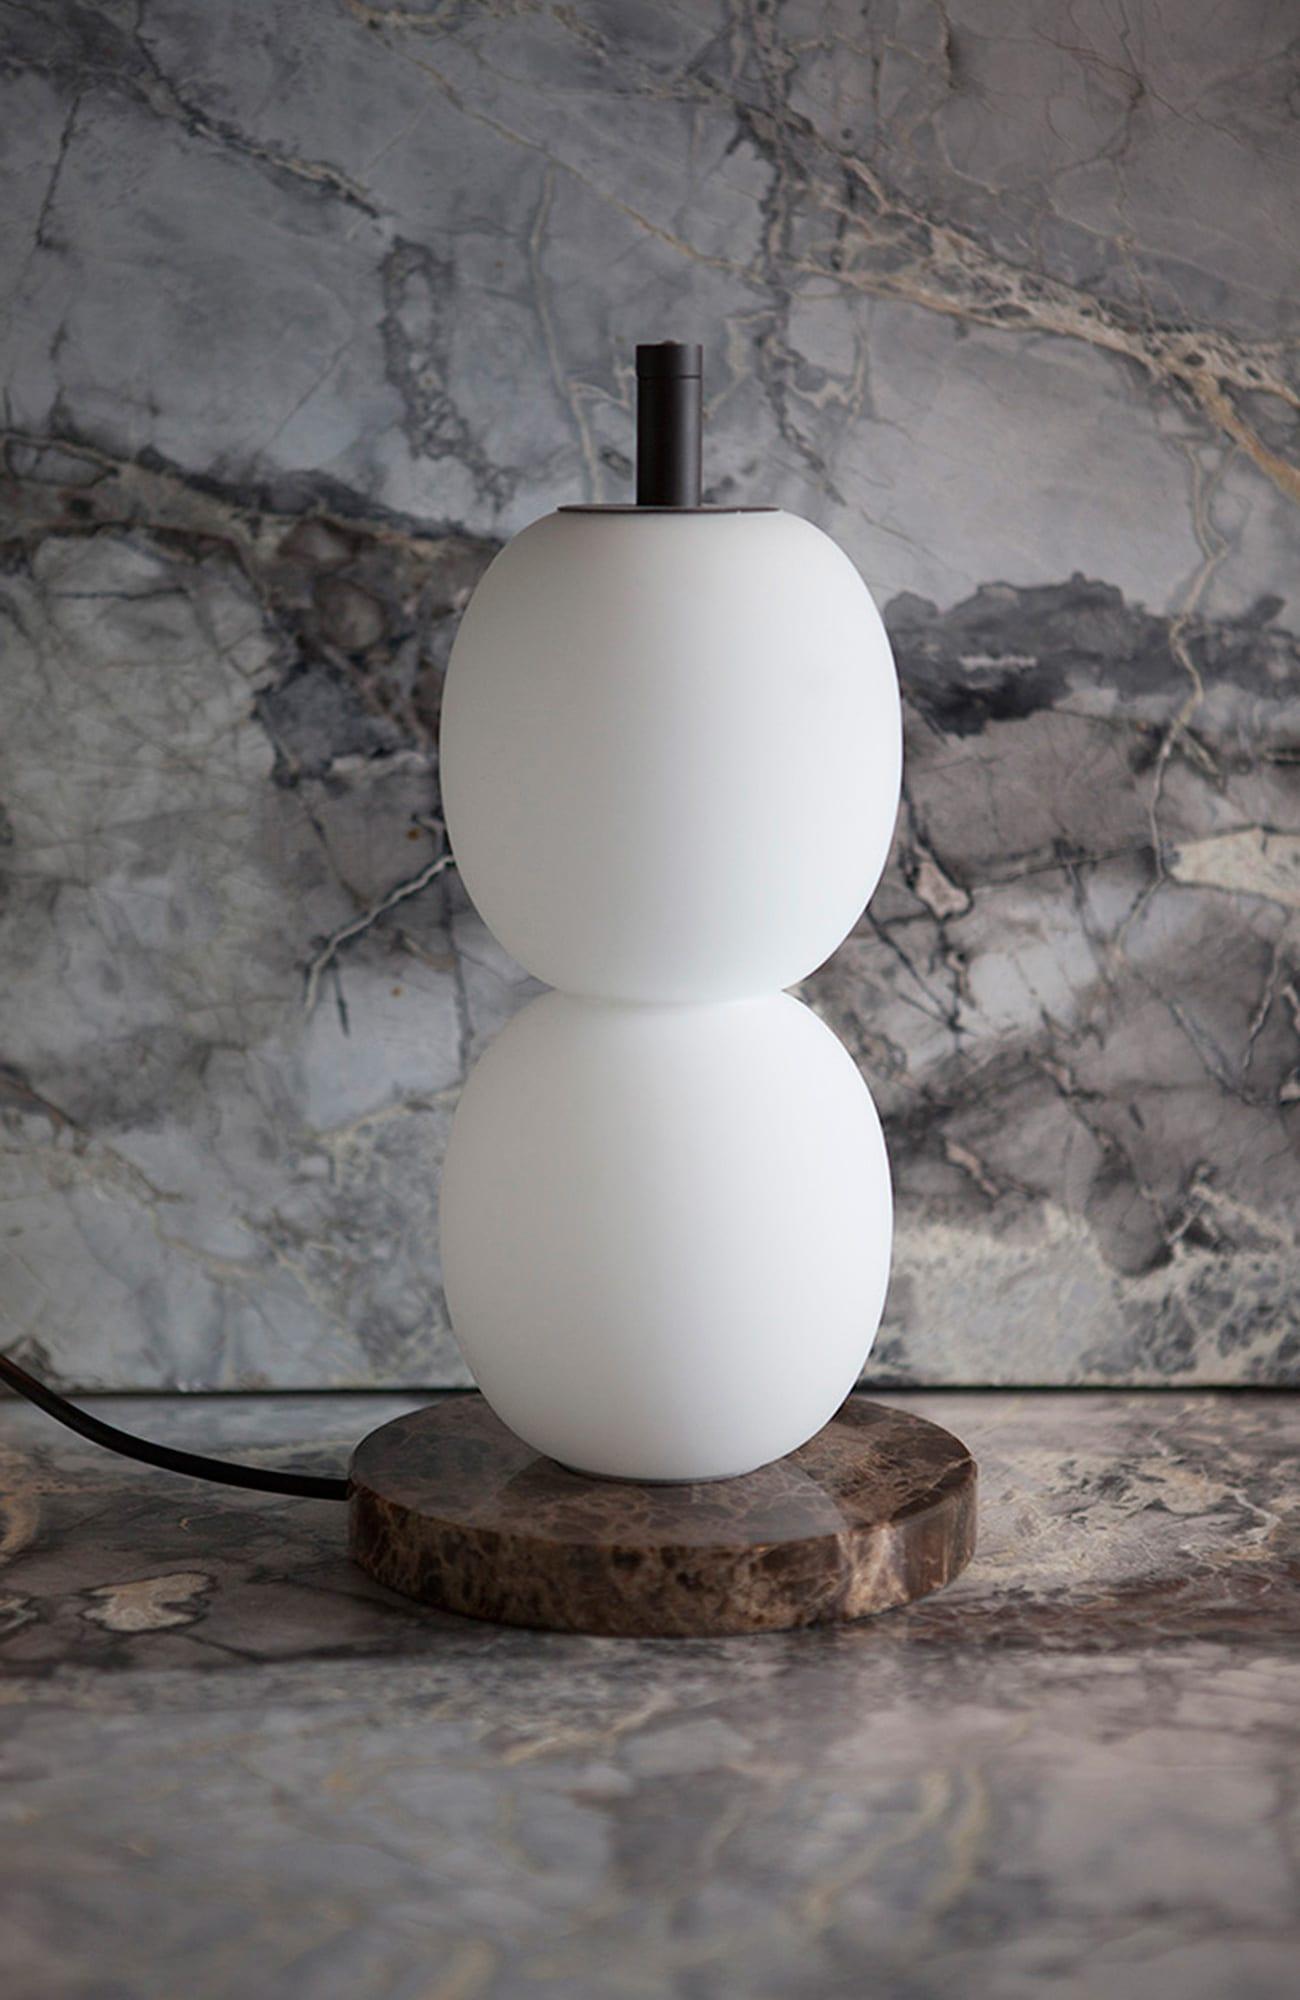 Mainkai Floor Lamp by Sebastian Herkner for Avenue Road at IMM Cologne 2018 | Yellowtrace